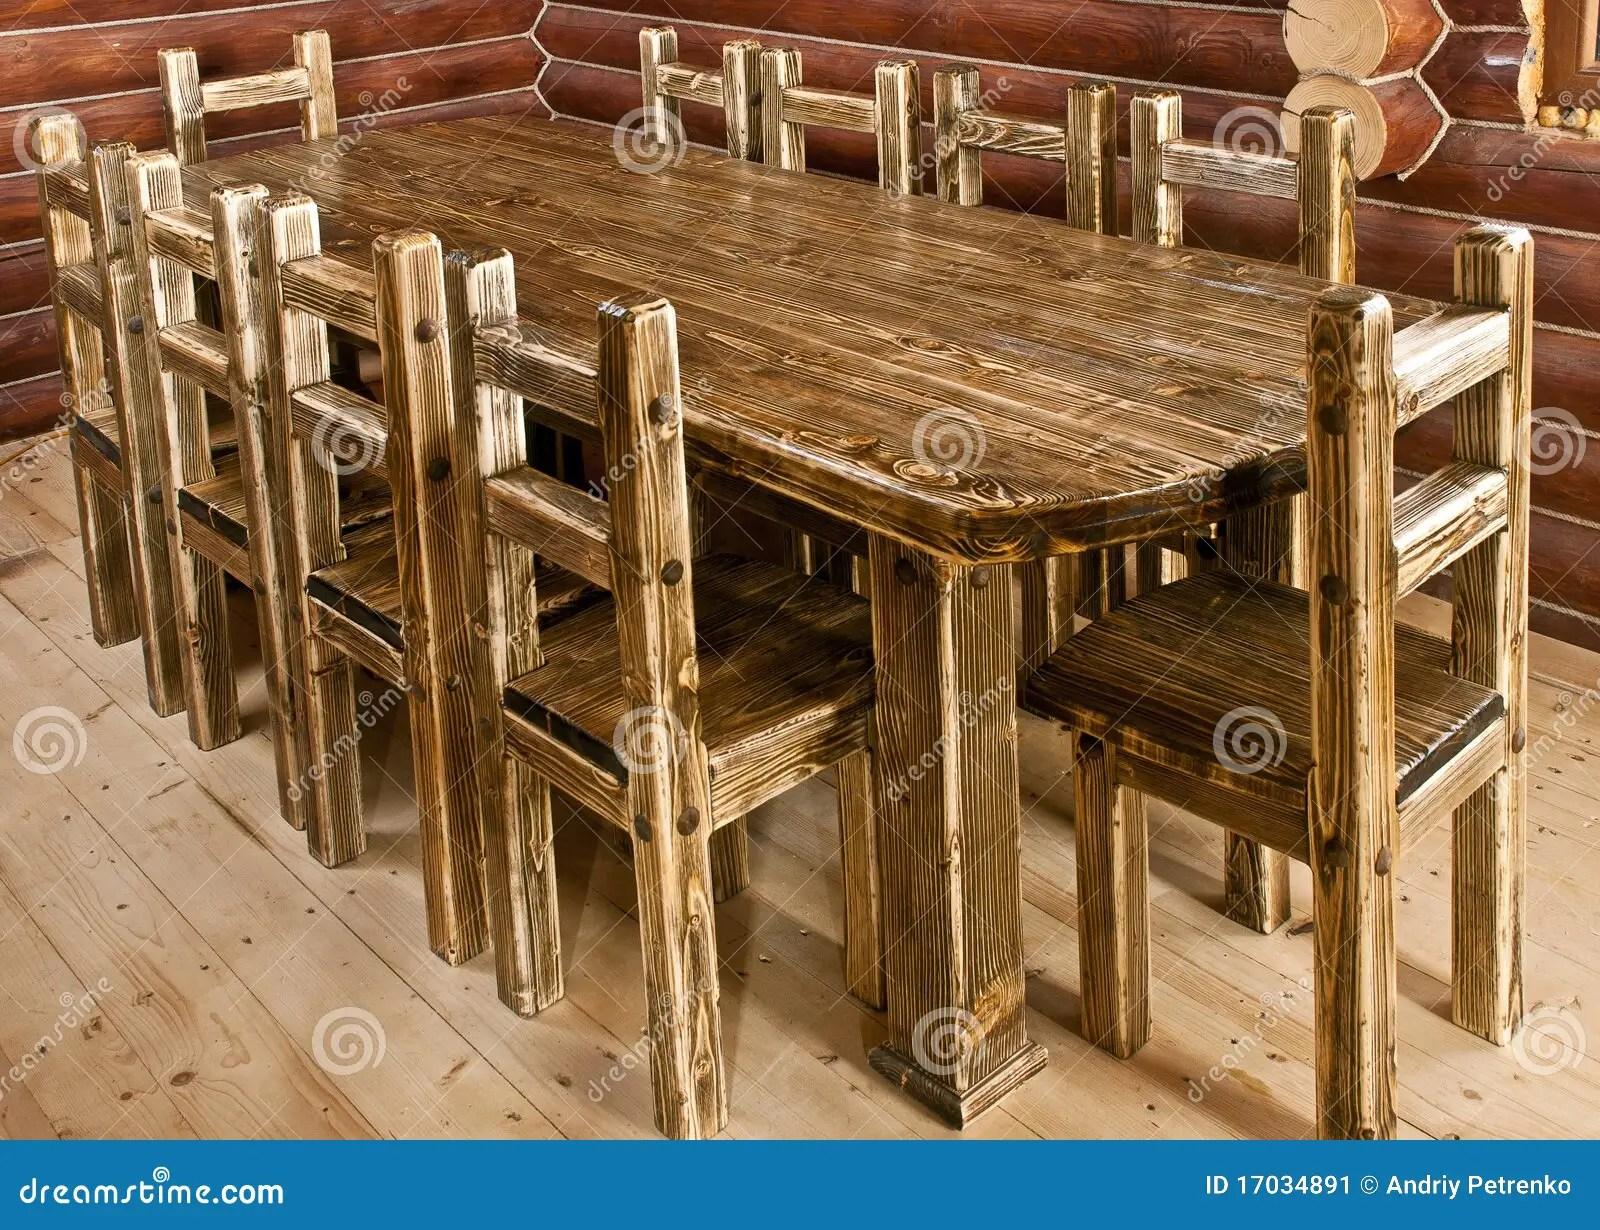 stock image handmade large kitchen table image large kitchen tables Handmade large kitchen table